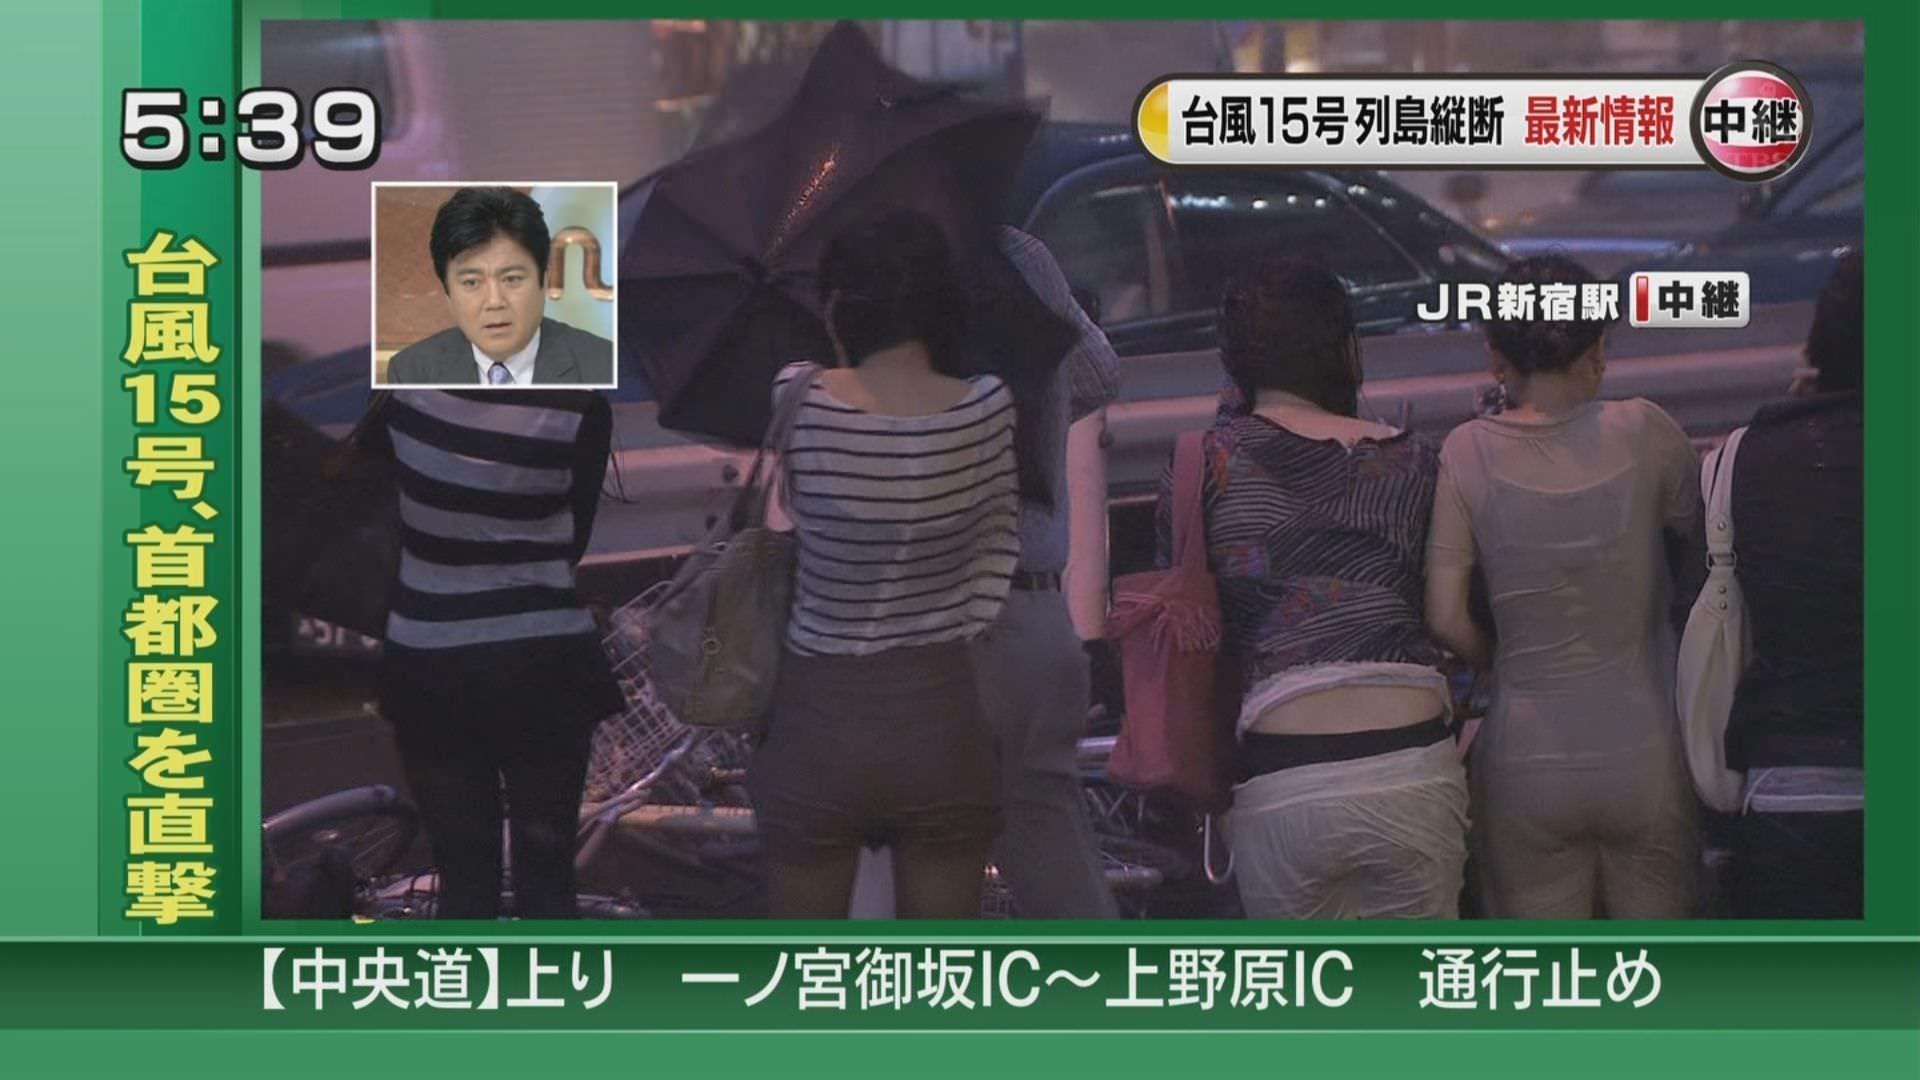 TVニュースの台風中継で映ったガチ素人のパンチラや透けブラエロ画像 2031